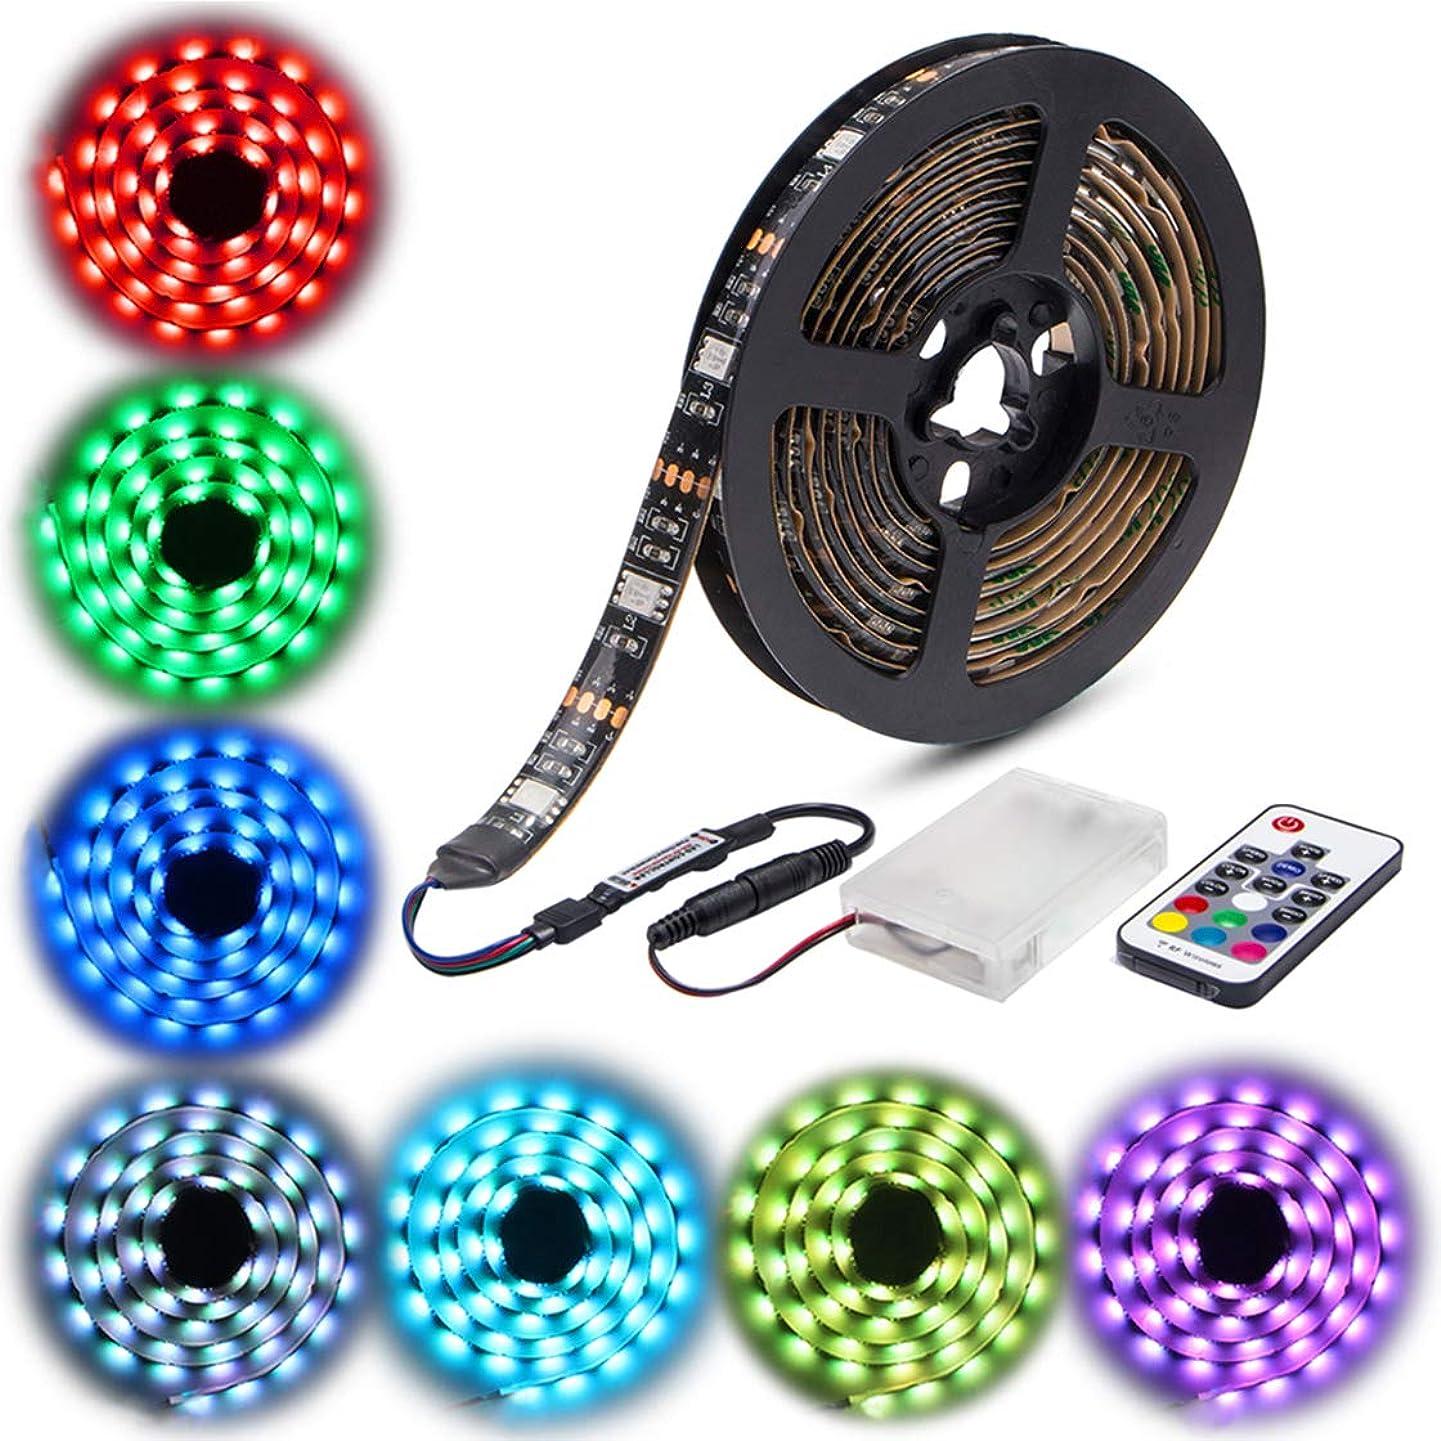 Led Strip Lights Battery Powered,abtong RGB Led Strip Rope Lights Waterproof Led Lights with Remote Control Flexible Led Strip Lighting-2M/6.56ft